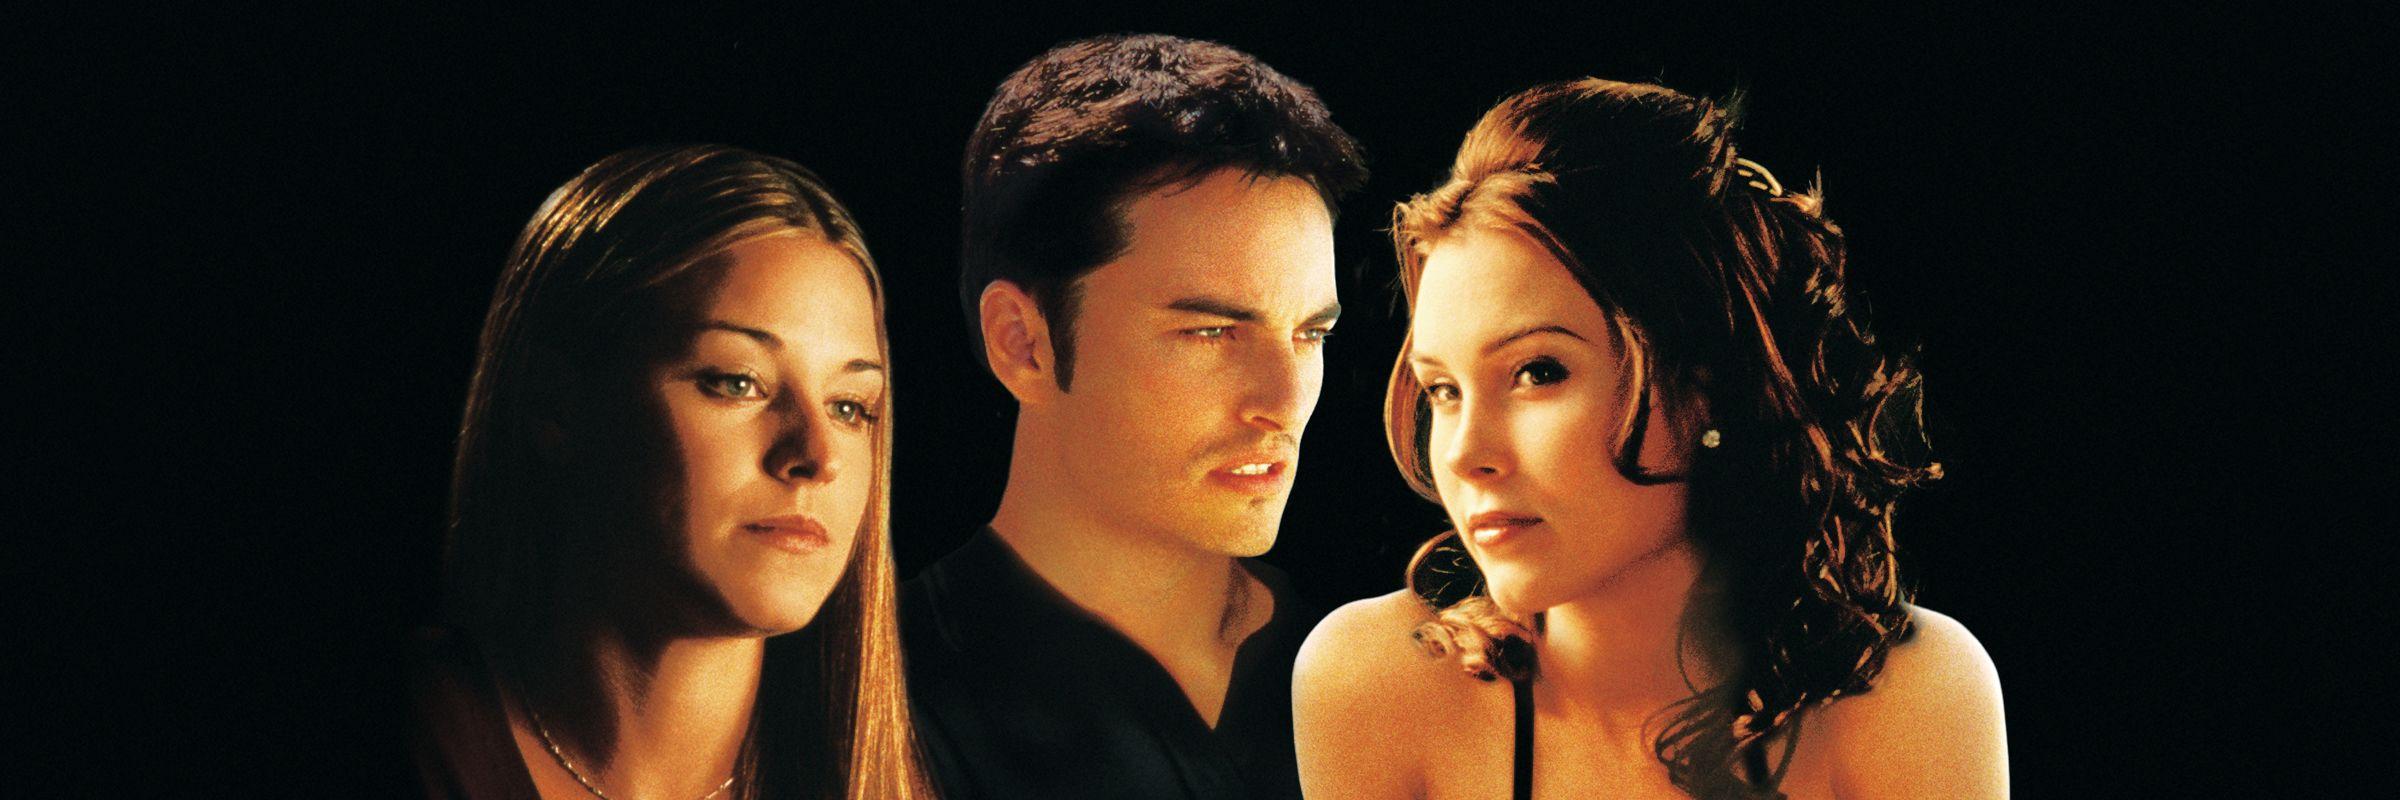 Cruel Intentions 3   Full Movie   Movies Anywhere